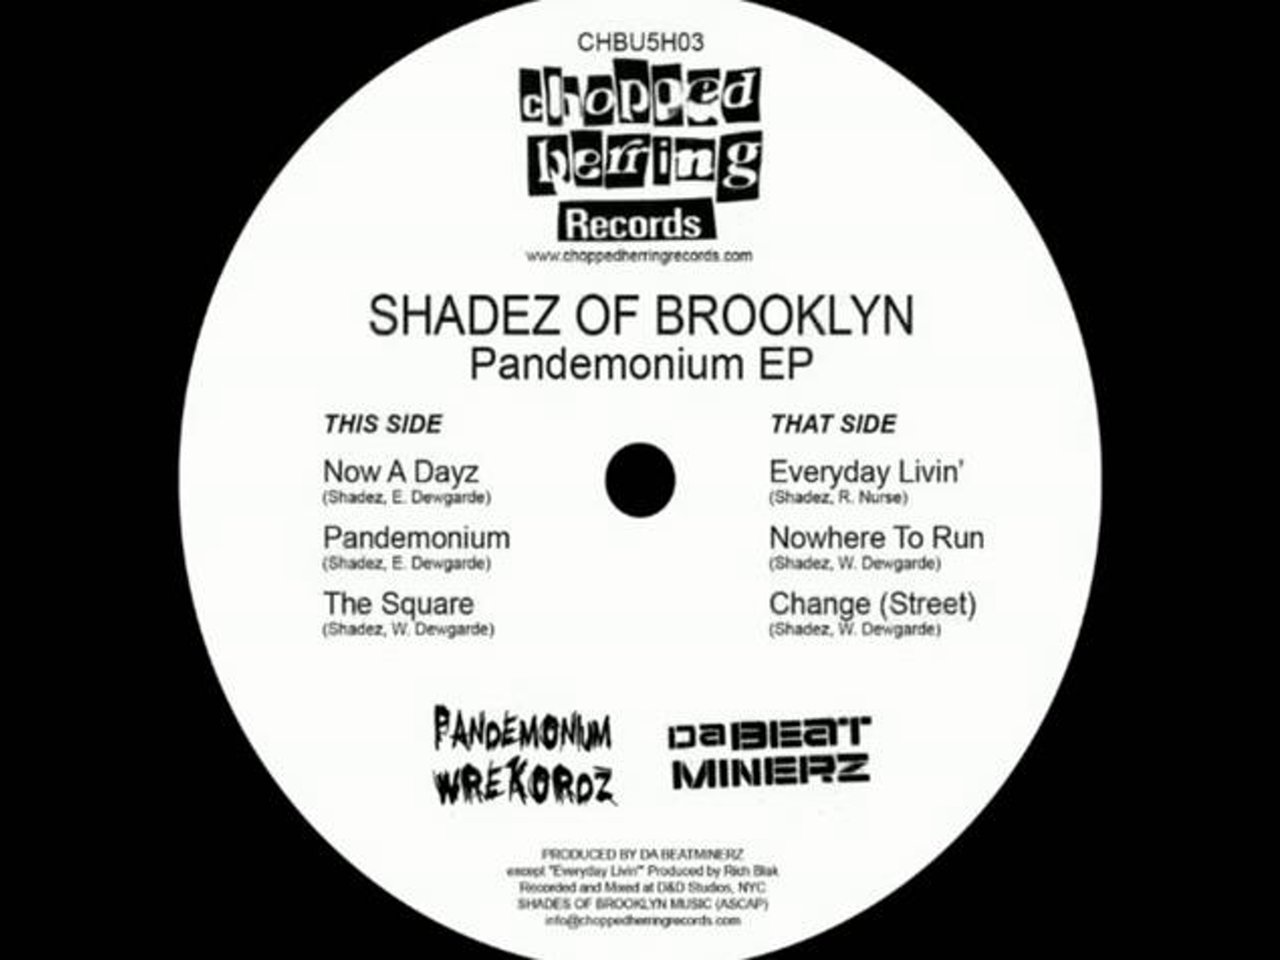 Shadez Of Brooklyn — Everyday Livin'